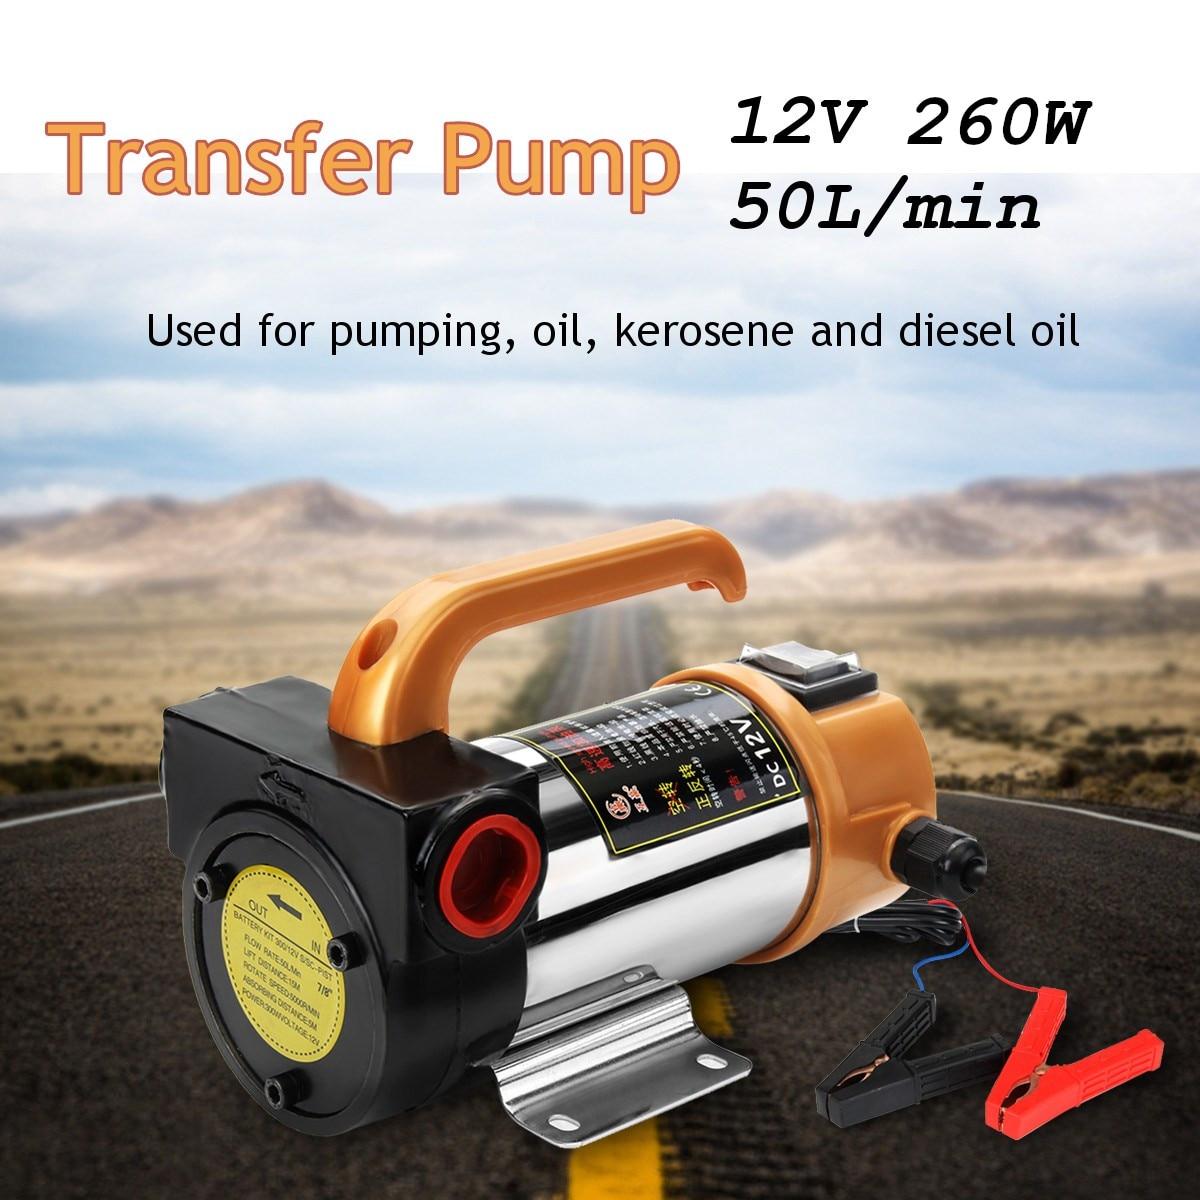 12V 260W Auto Motor Tragbare für Diesel Heizöl Transfer Pumpe Selbst Grundierung Öl Pumpe 50L/Min